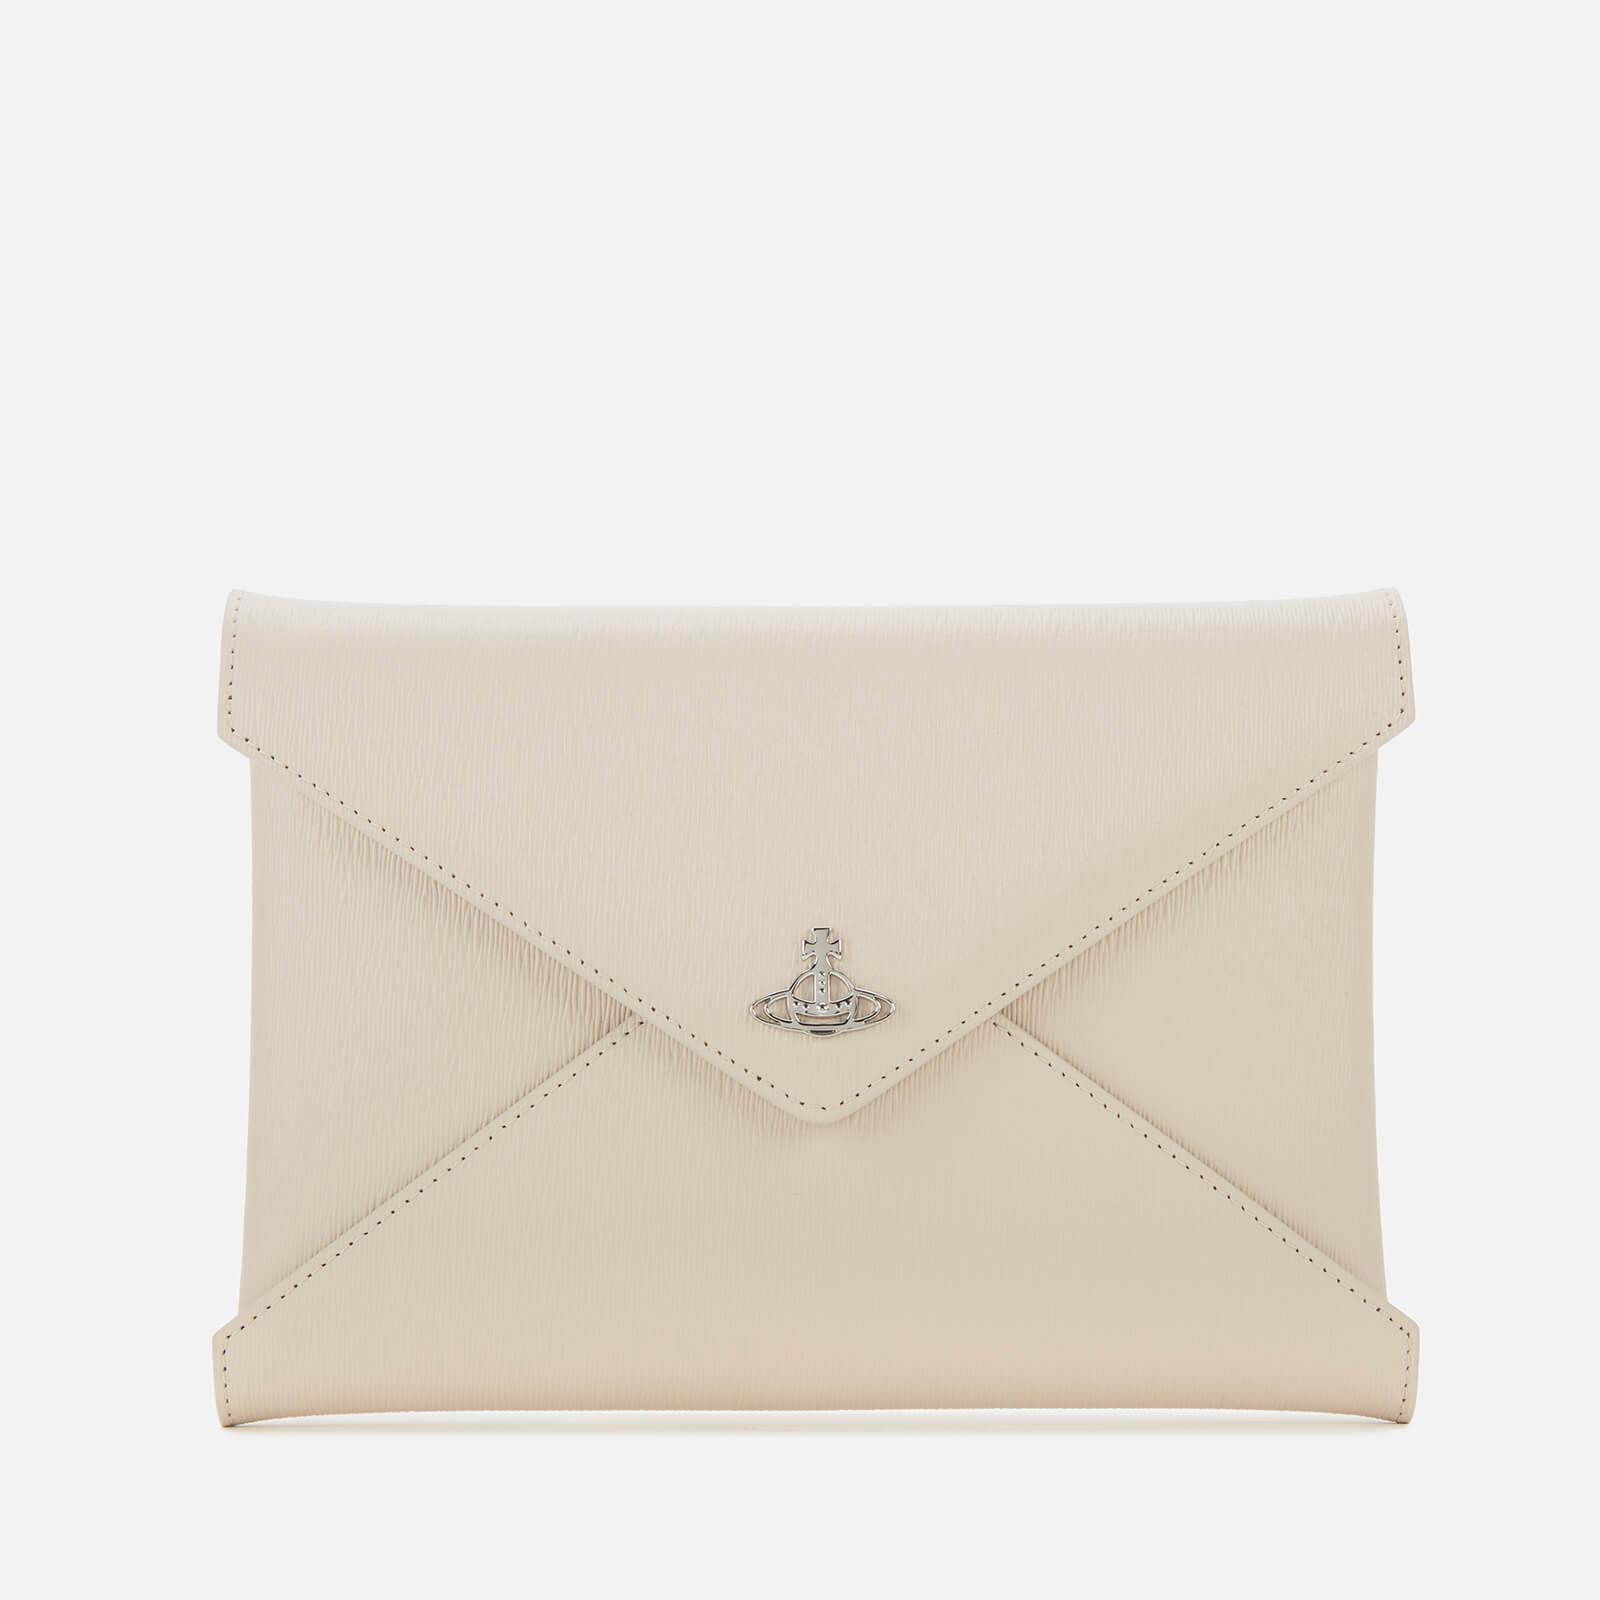 Vivienne Westwood Women's Bella Pouch Bag - Beige